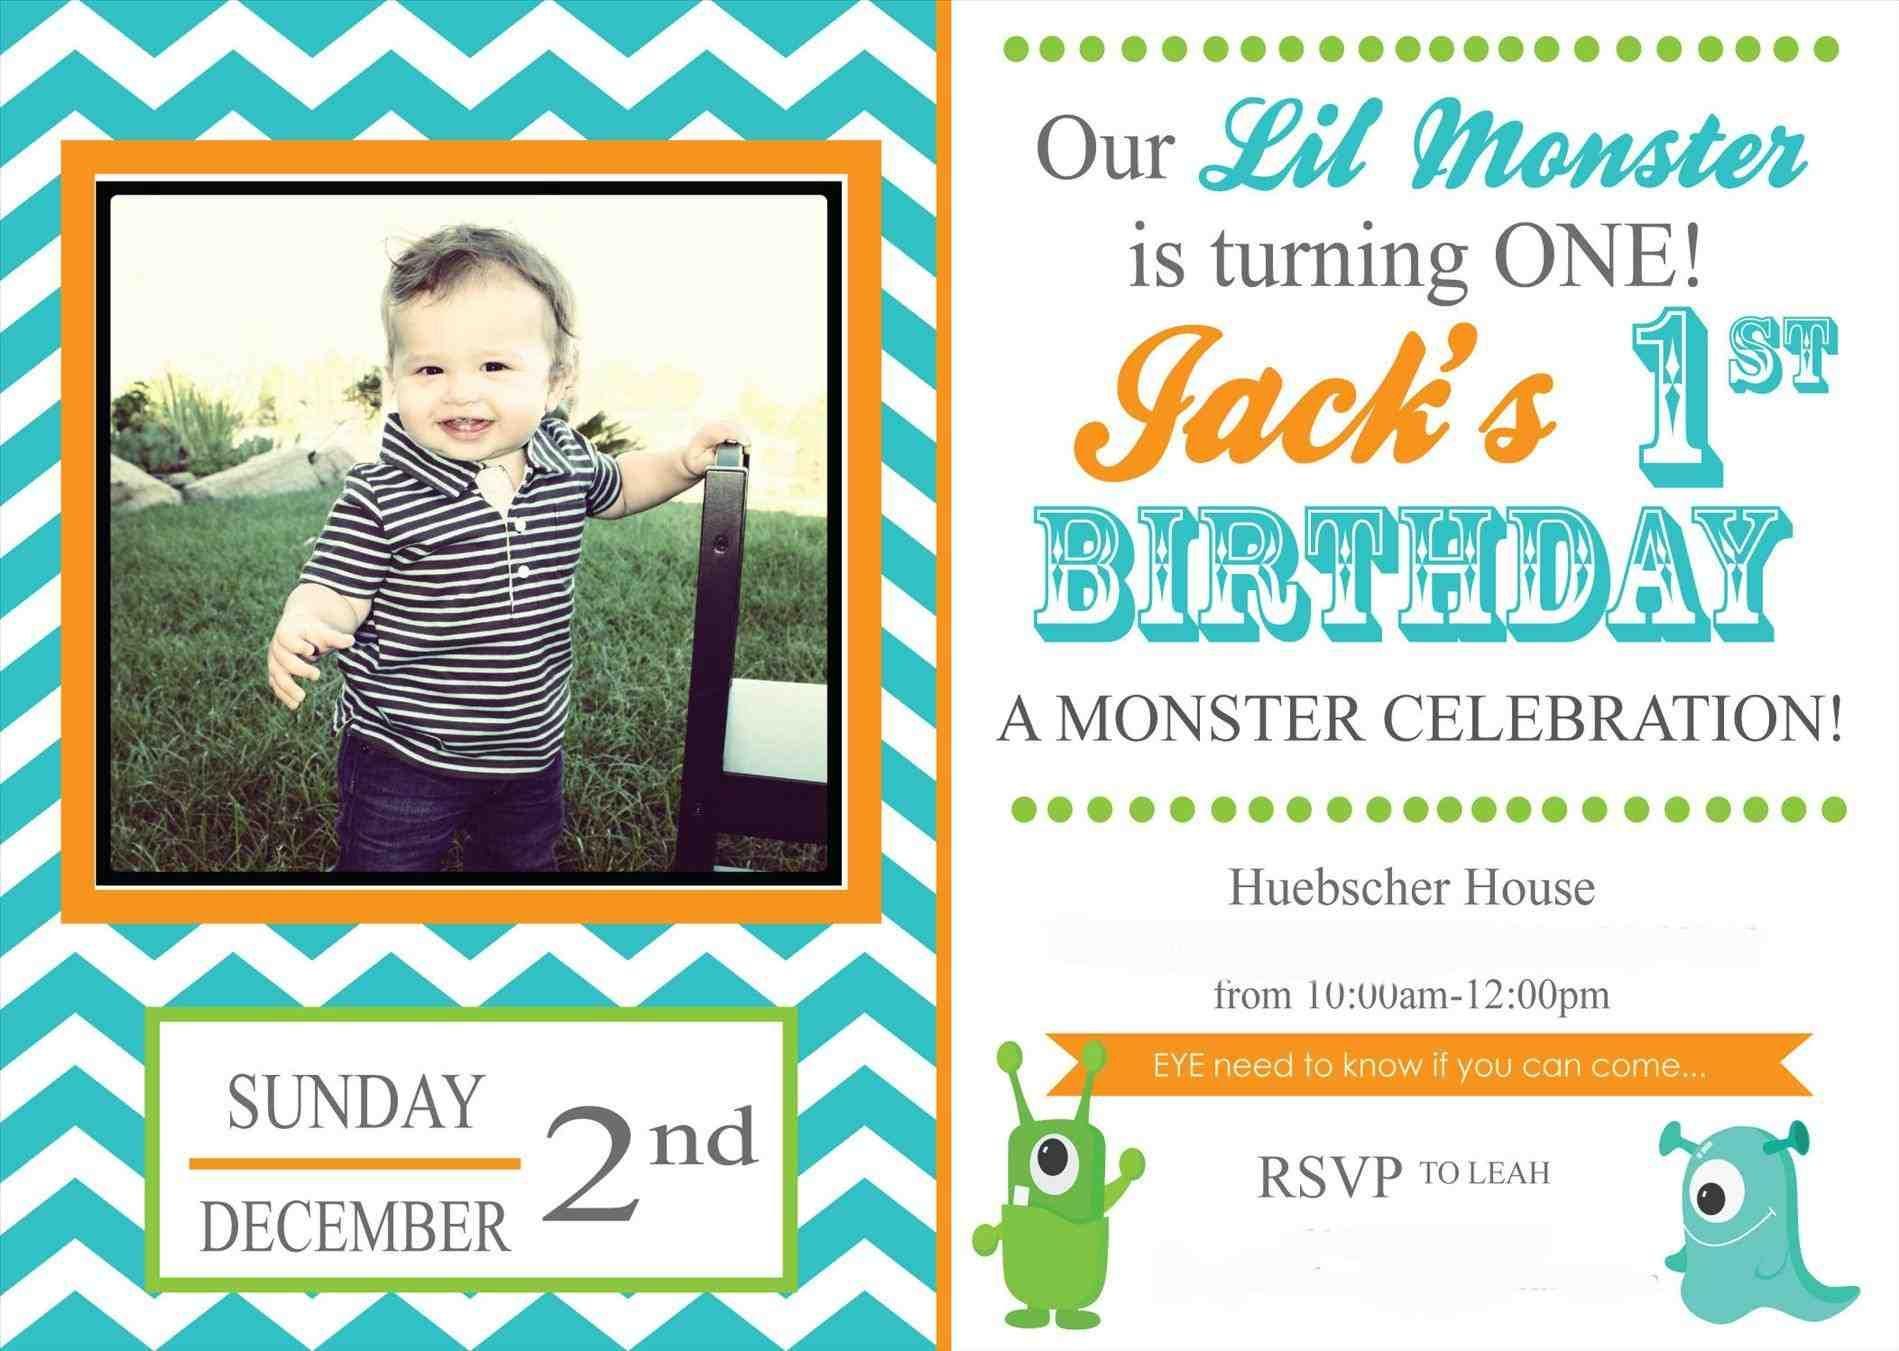 80th birthday party invitations templates. diy birthday cards ...